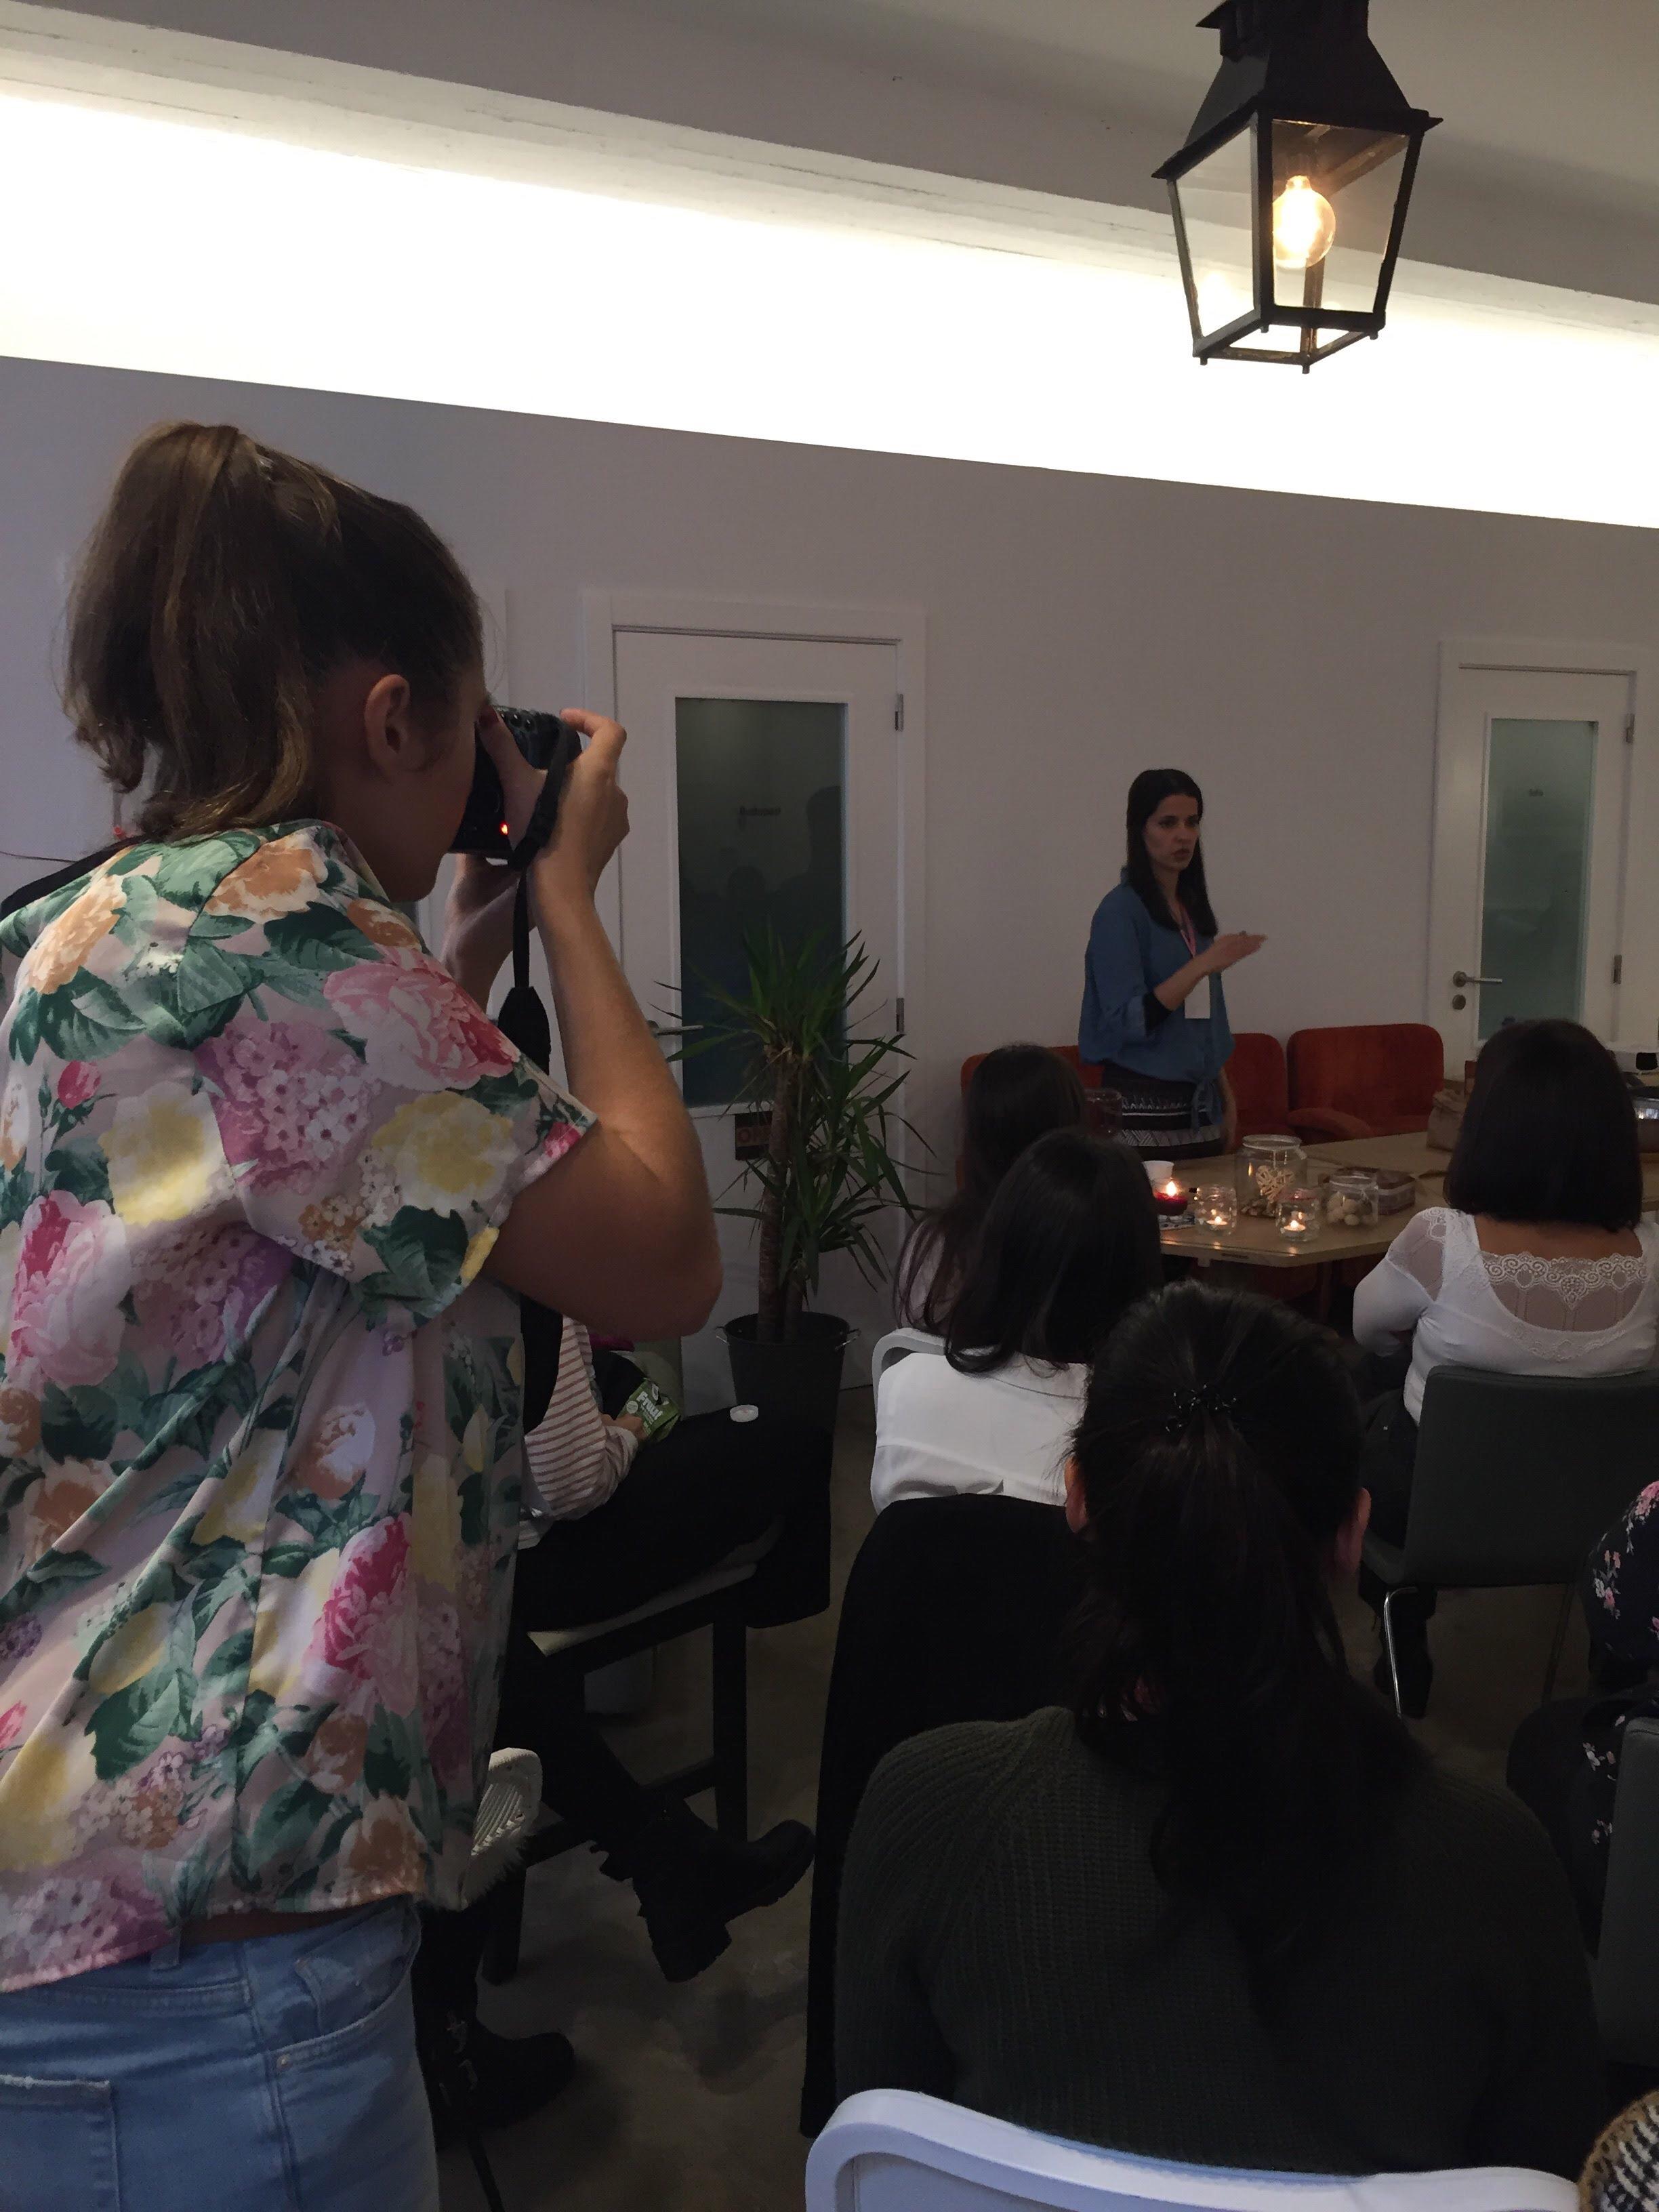 Bless woman a fotografar o Blogging for a cause